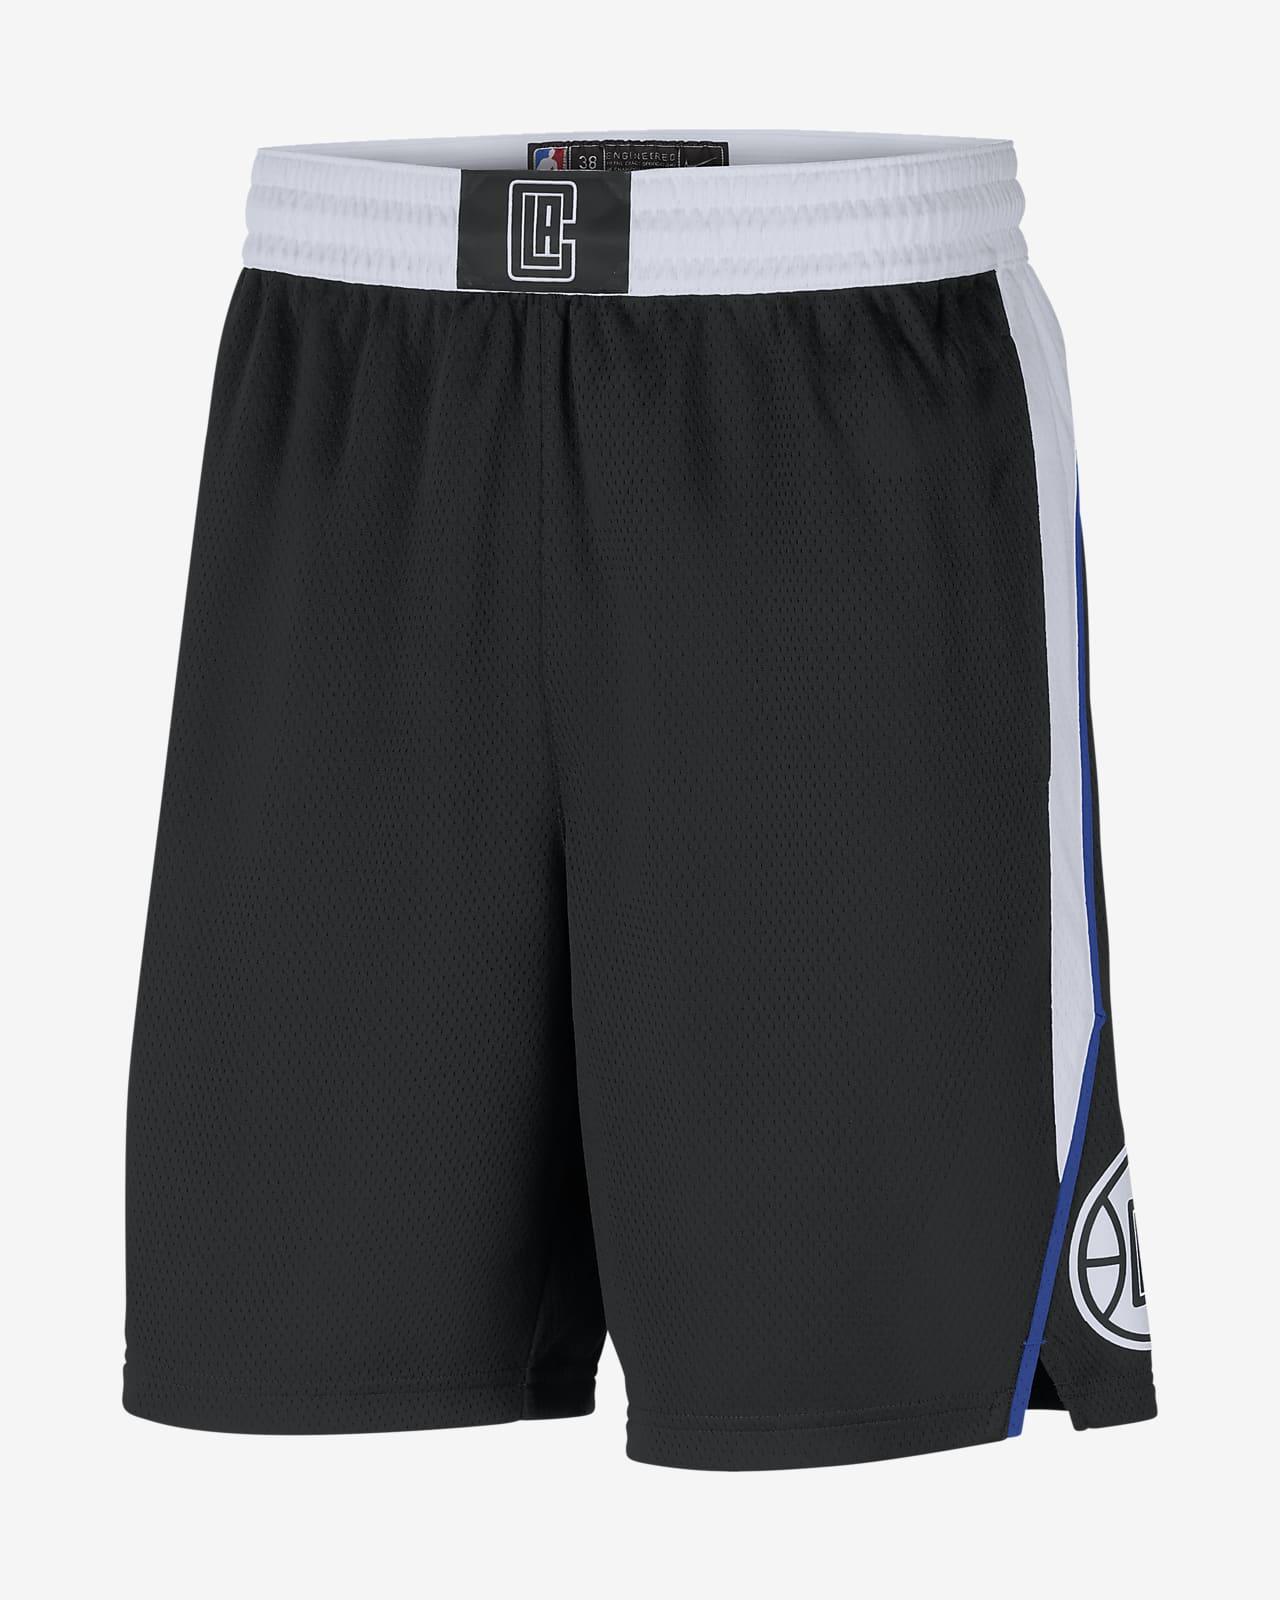 LA Clippers City Edition 2020 Men's Nike NBA Swingman Shorts